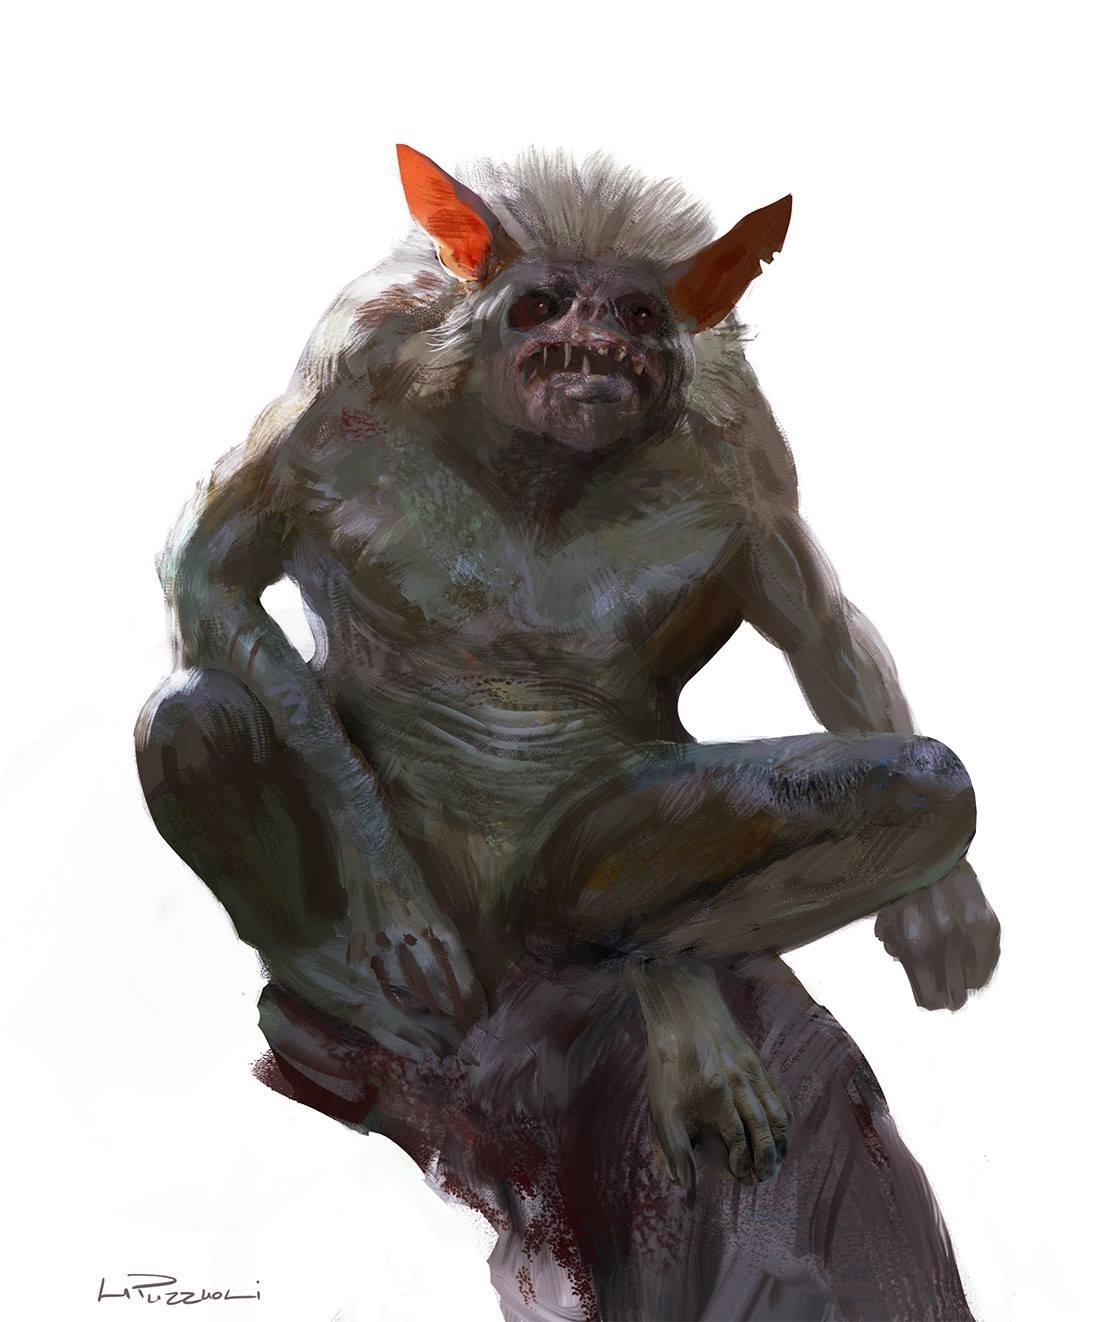 Hugo puzzuoli monkey monster